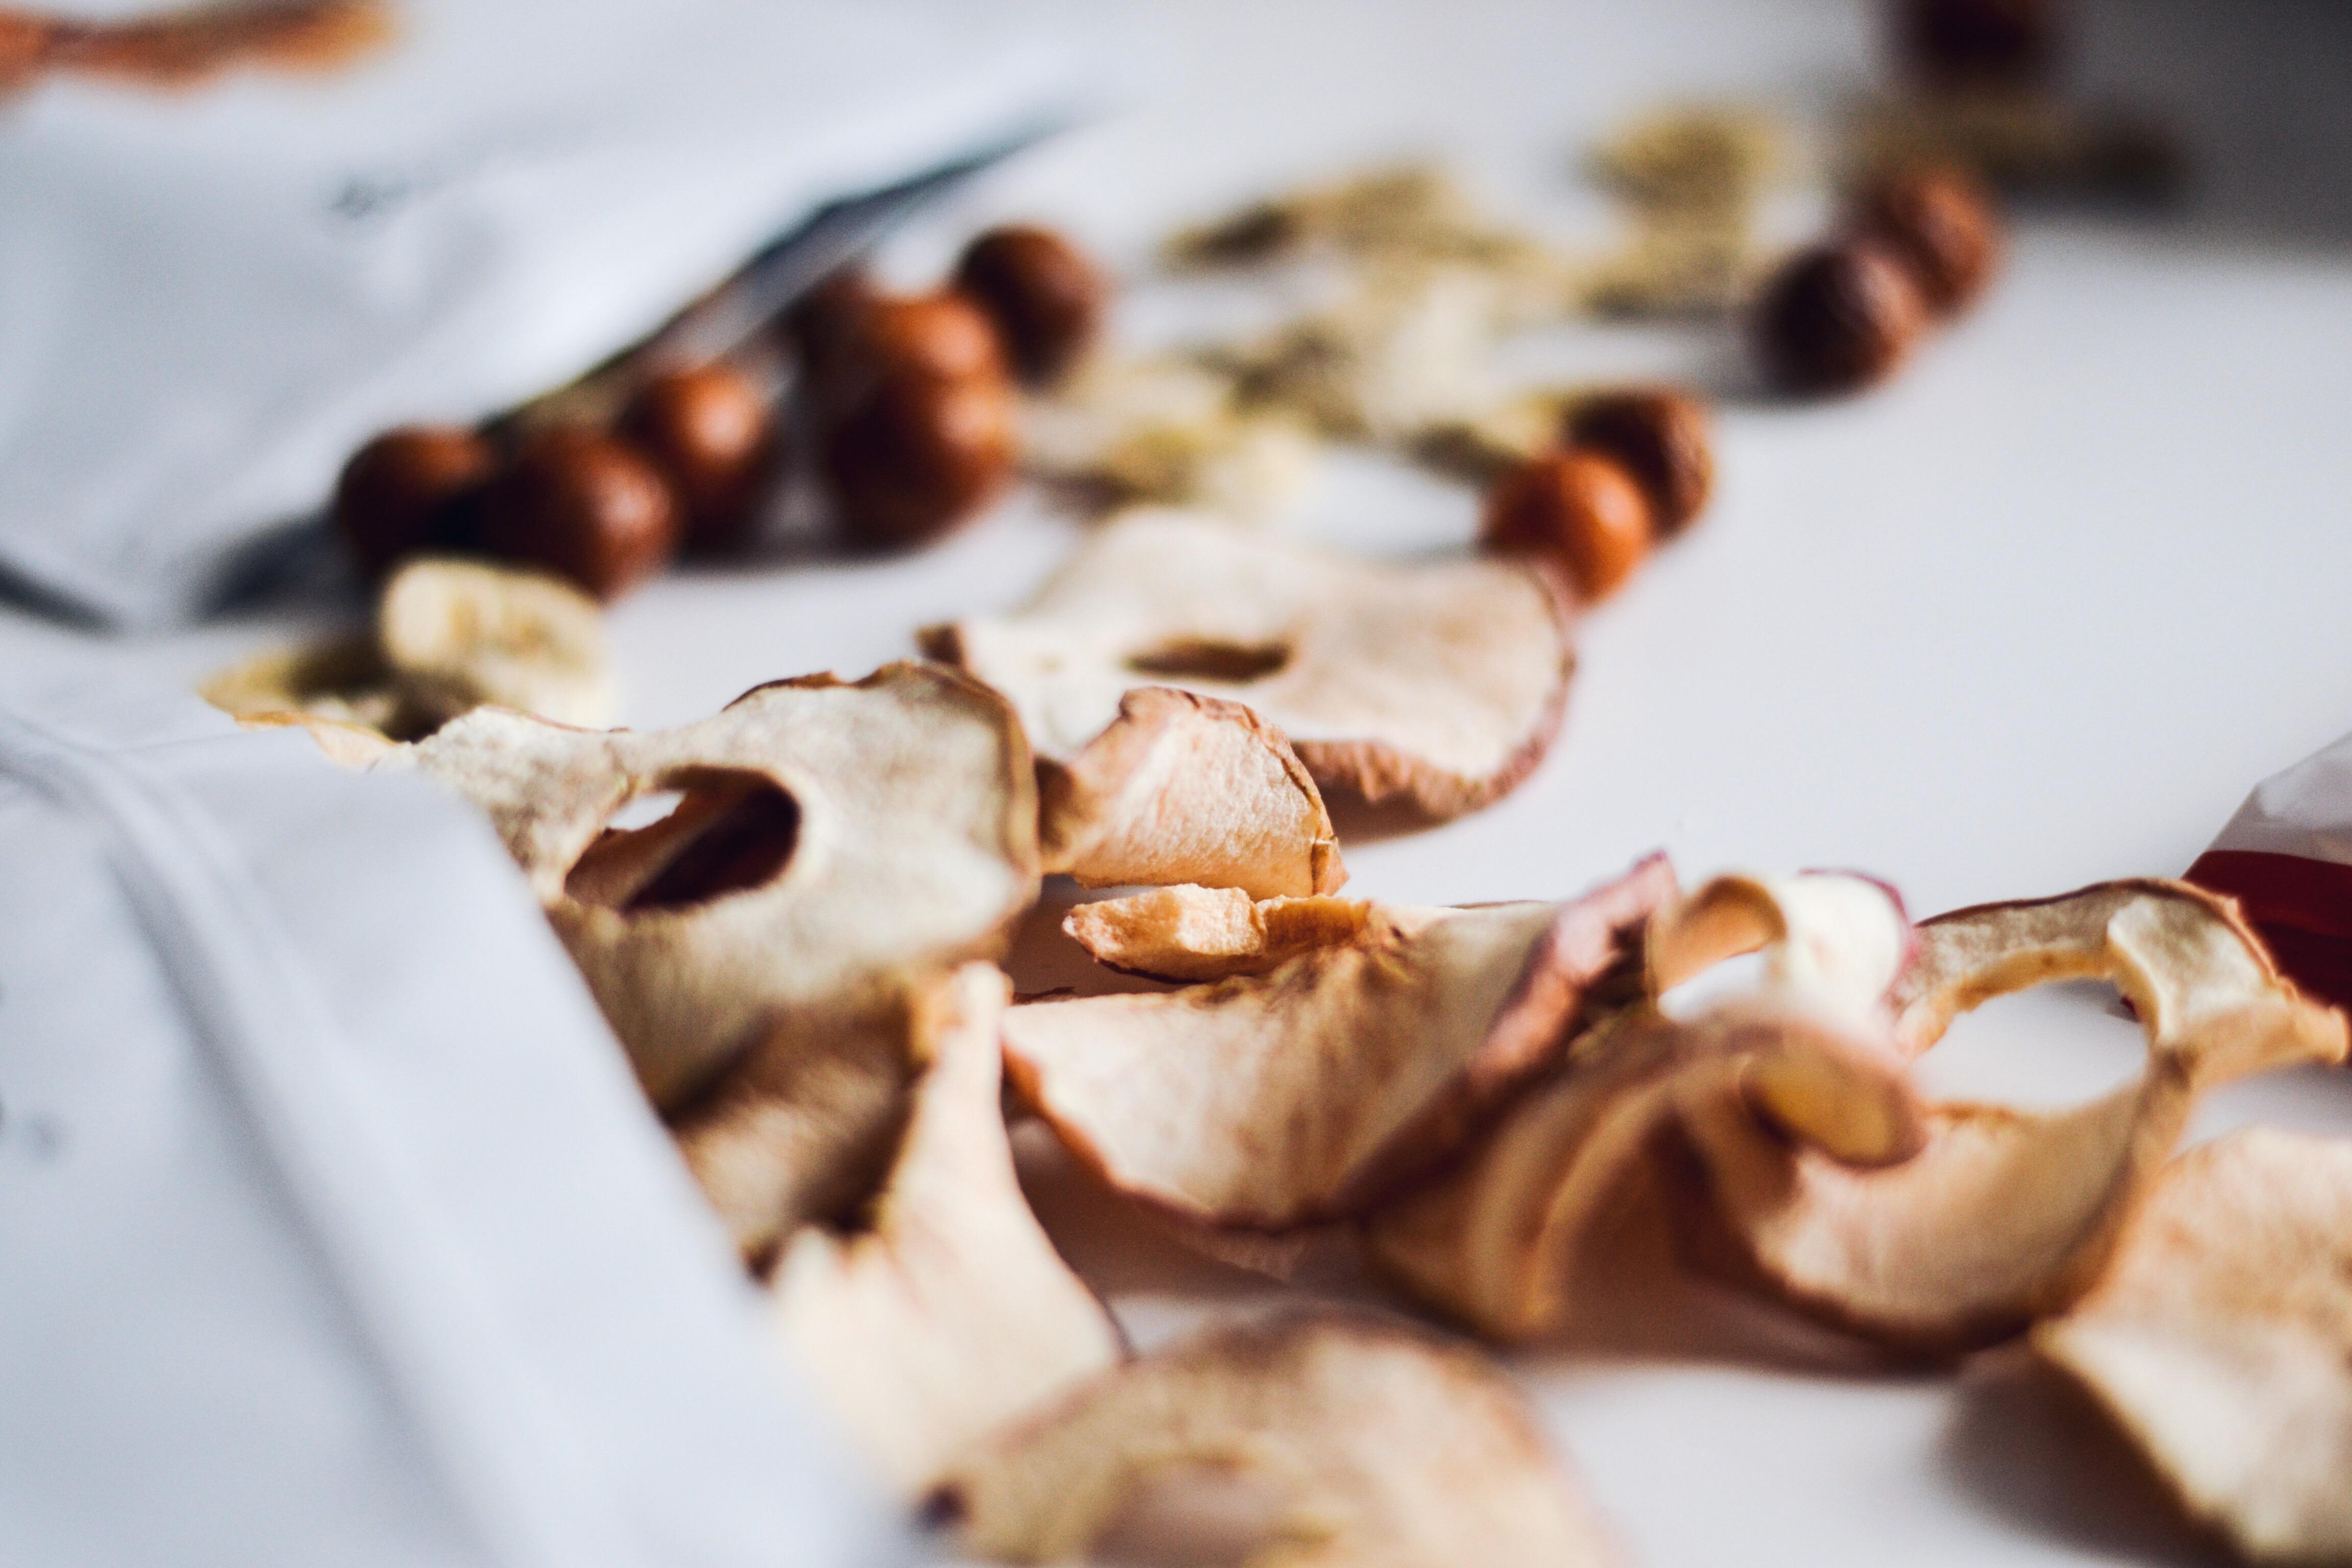 allthatchoices by laura fashionblogger mainz adventskalender blog foodspring crunchyfruits.JPG